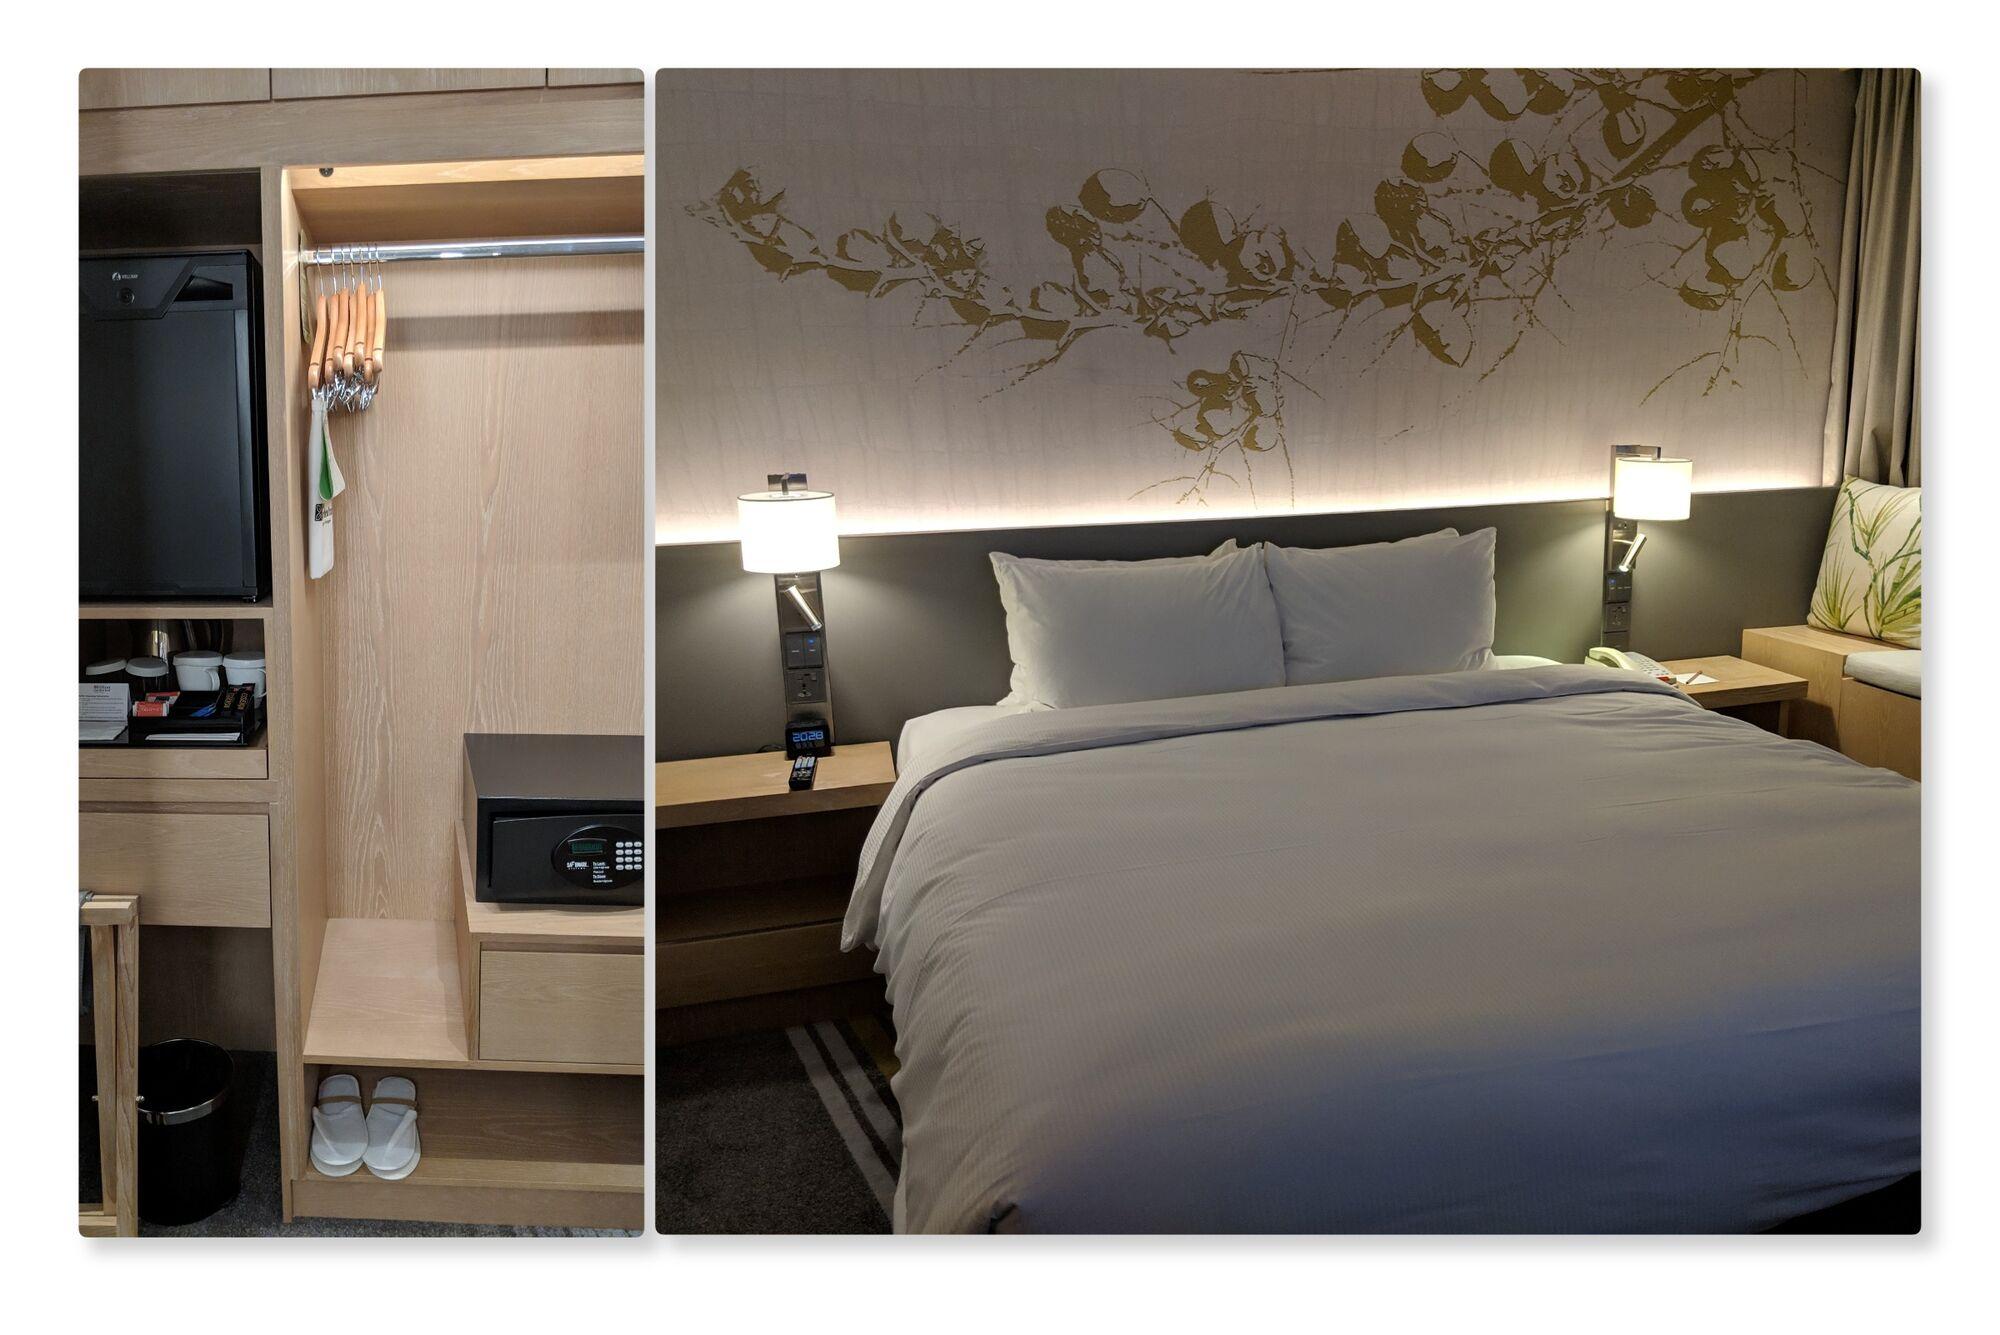 More view of King Deluxe Room, Hilton Garden Inn, Singapore